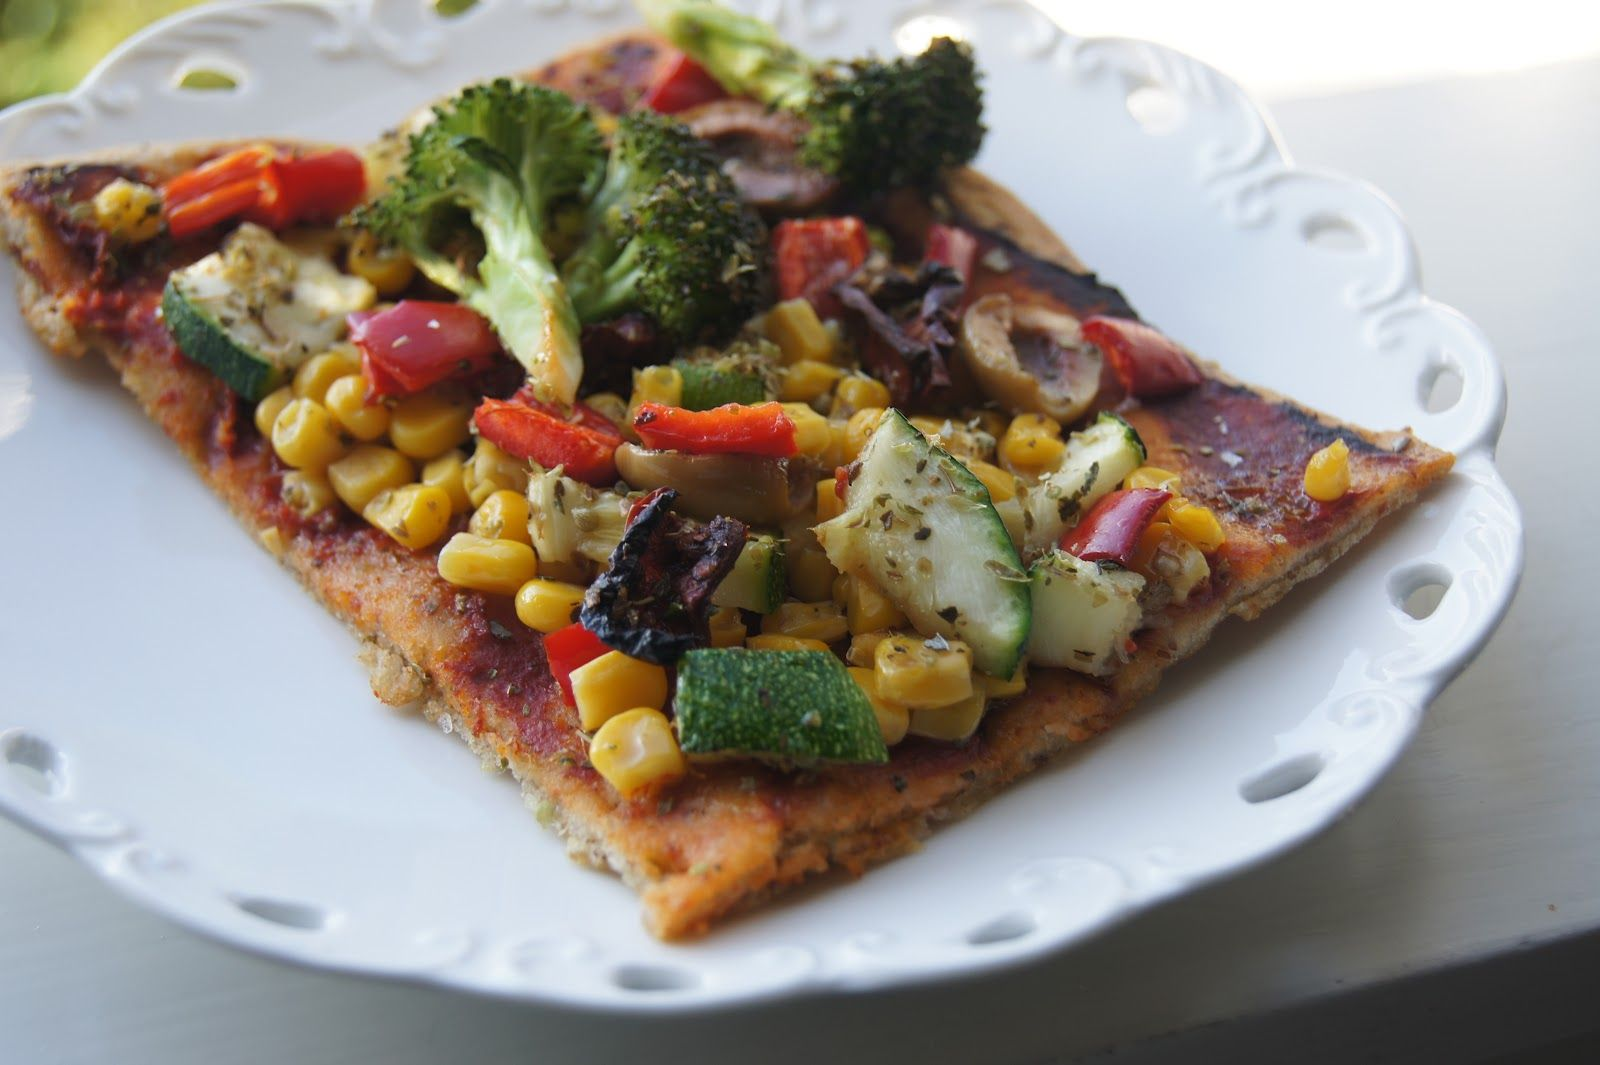 #Homemade whole-grain #gluten-free #vegan #pizza crust # ...